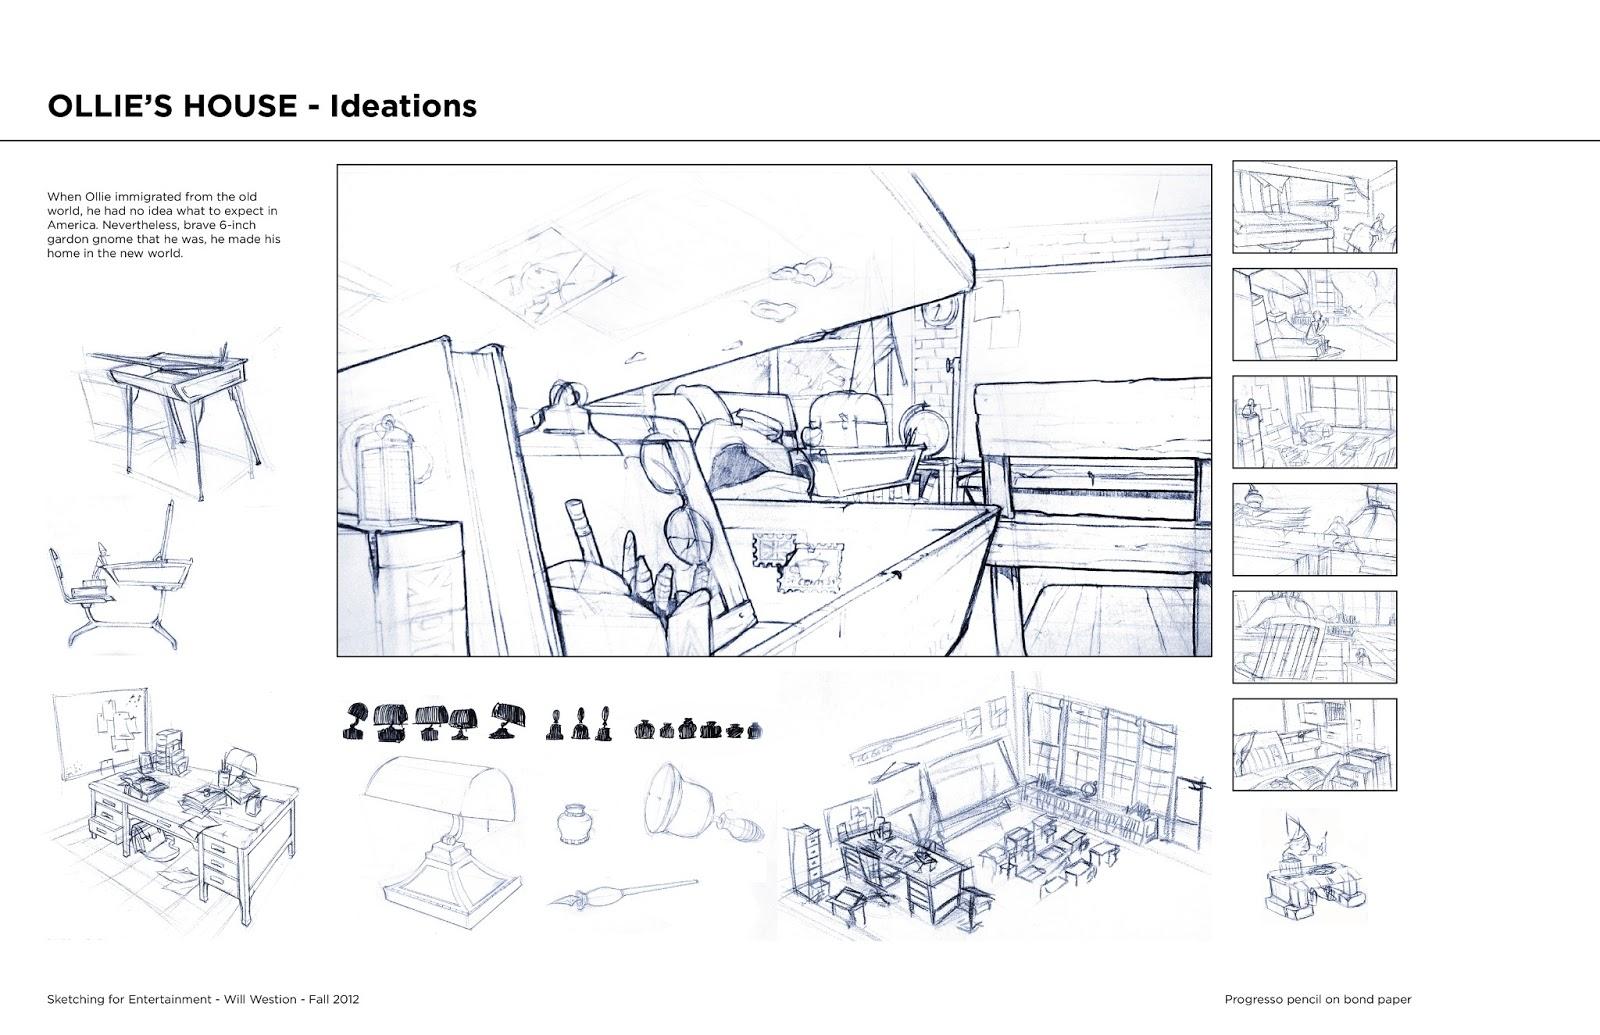 Tiffany Hayashi: Sketching for Entertainment on